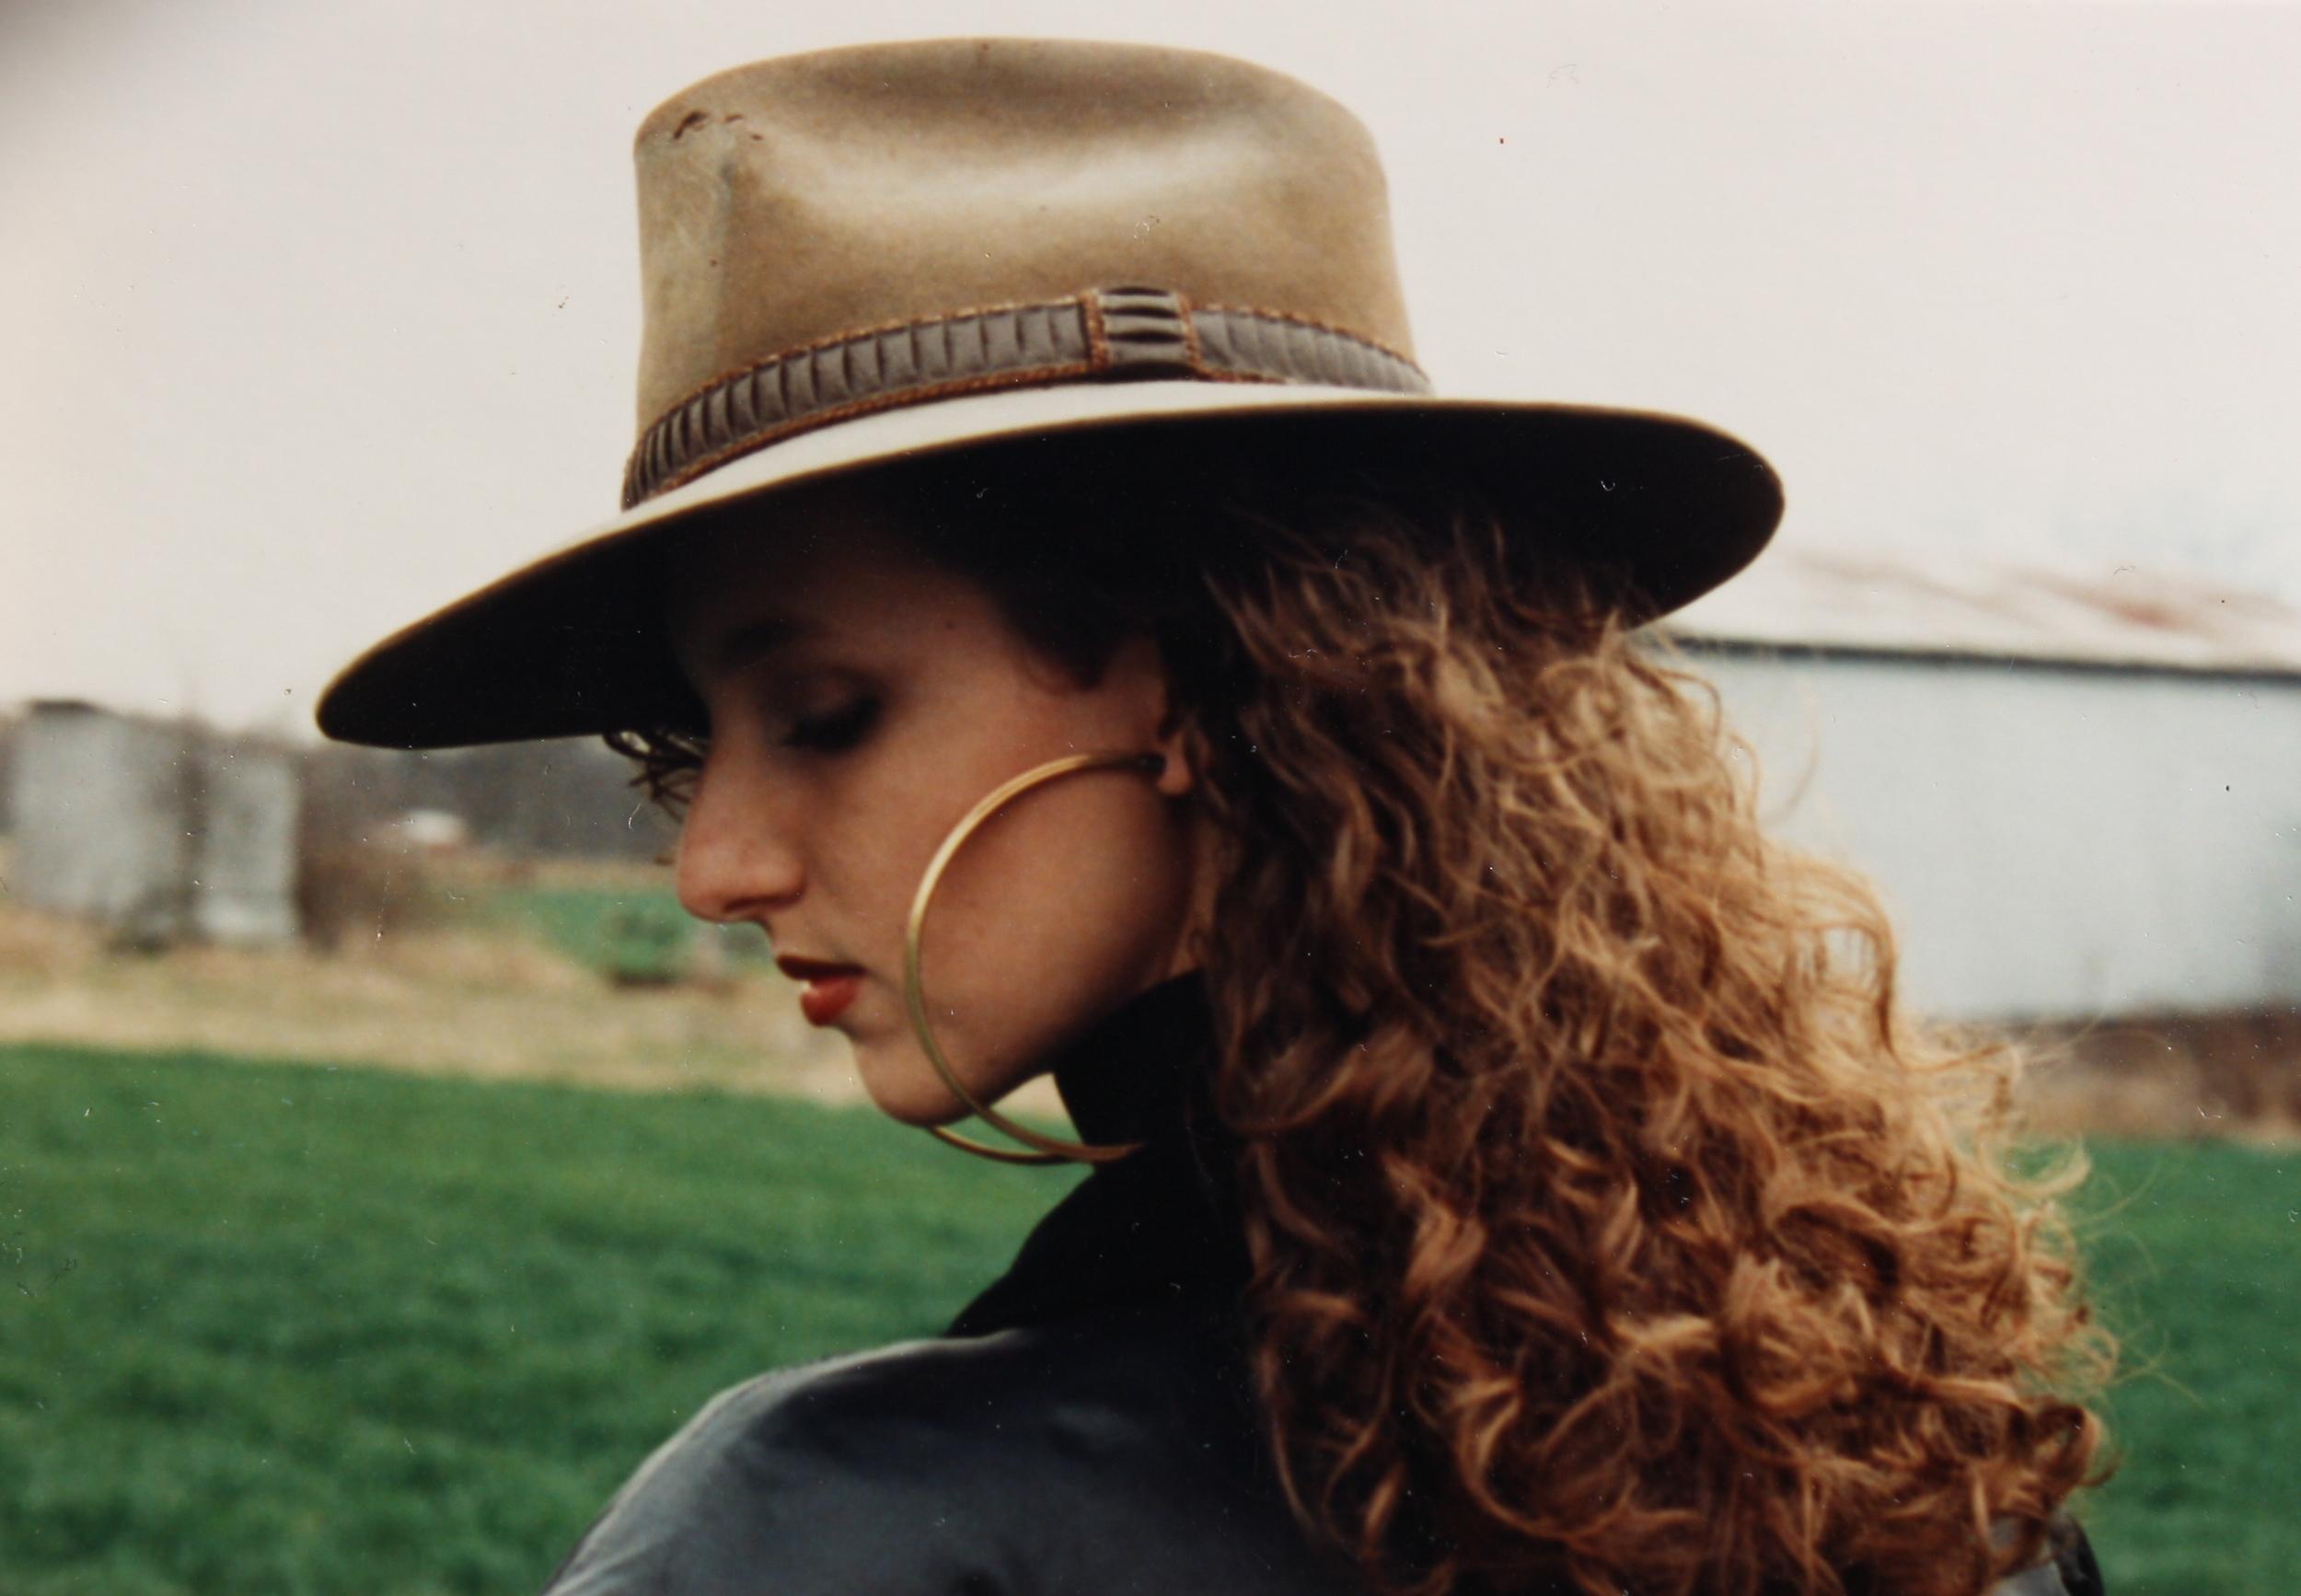 A hat wearing, big earring wearing college girl.